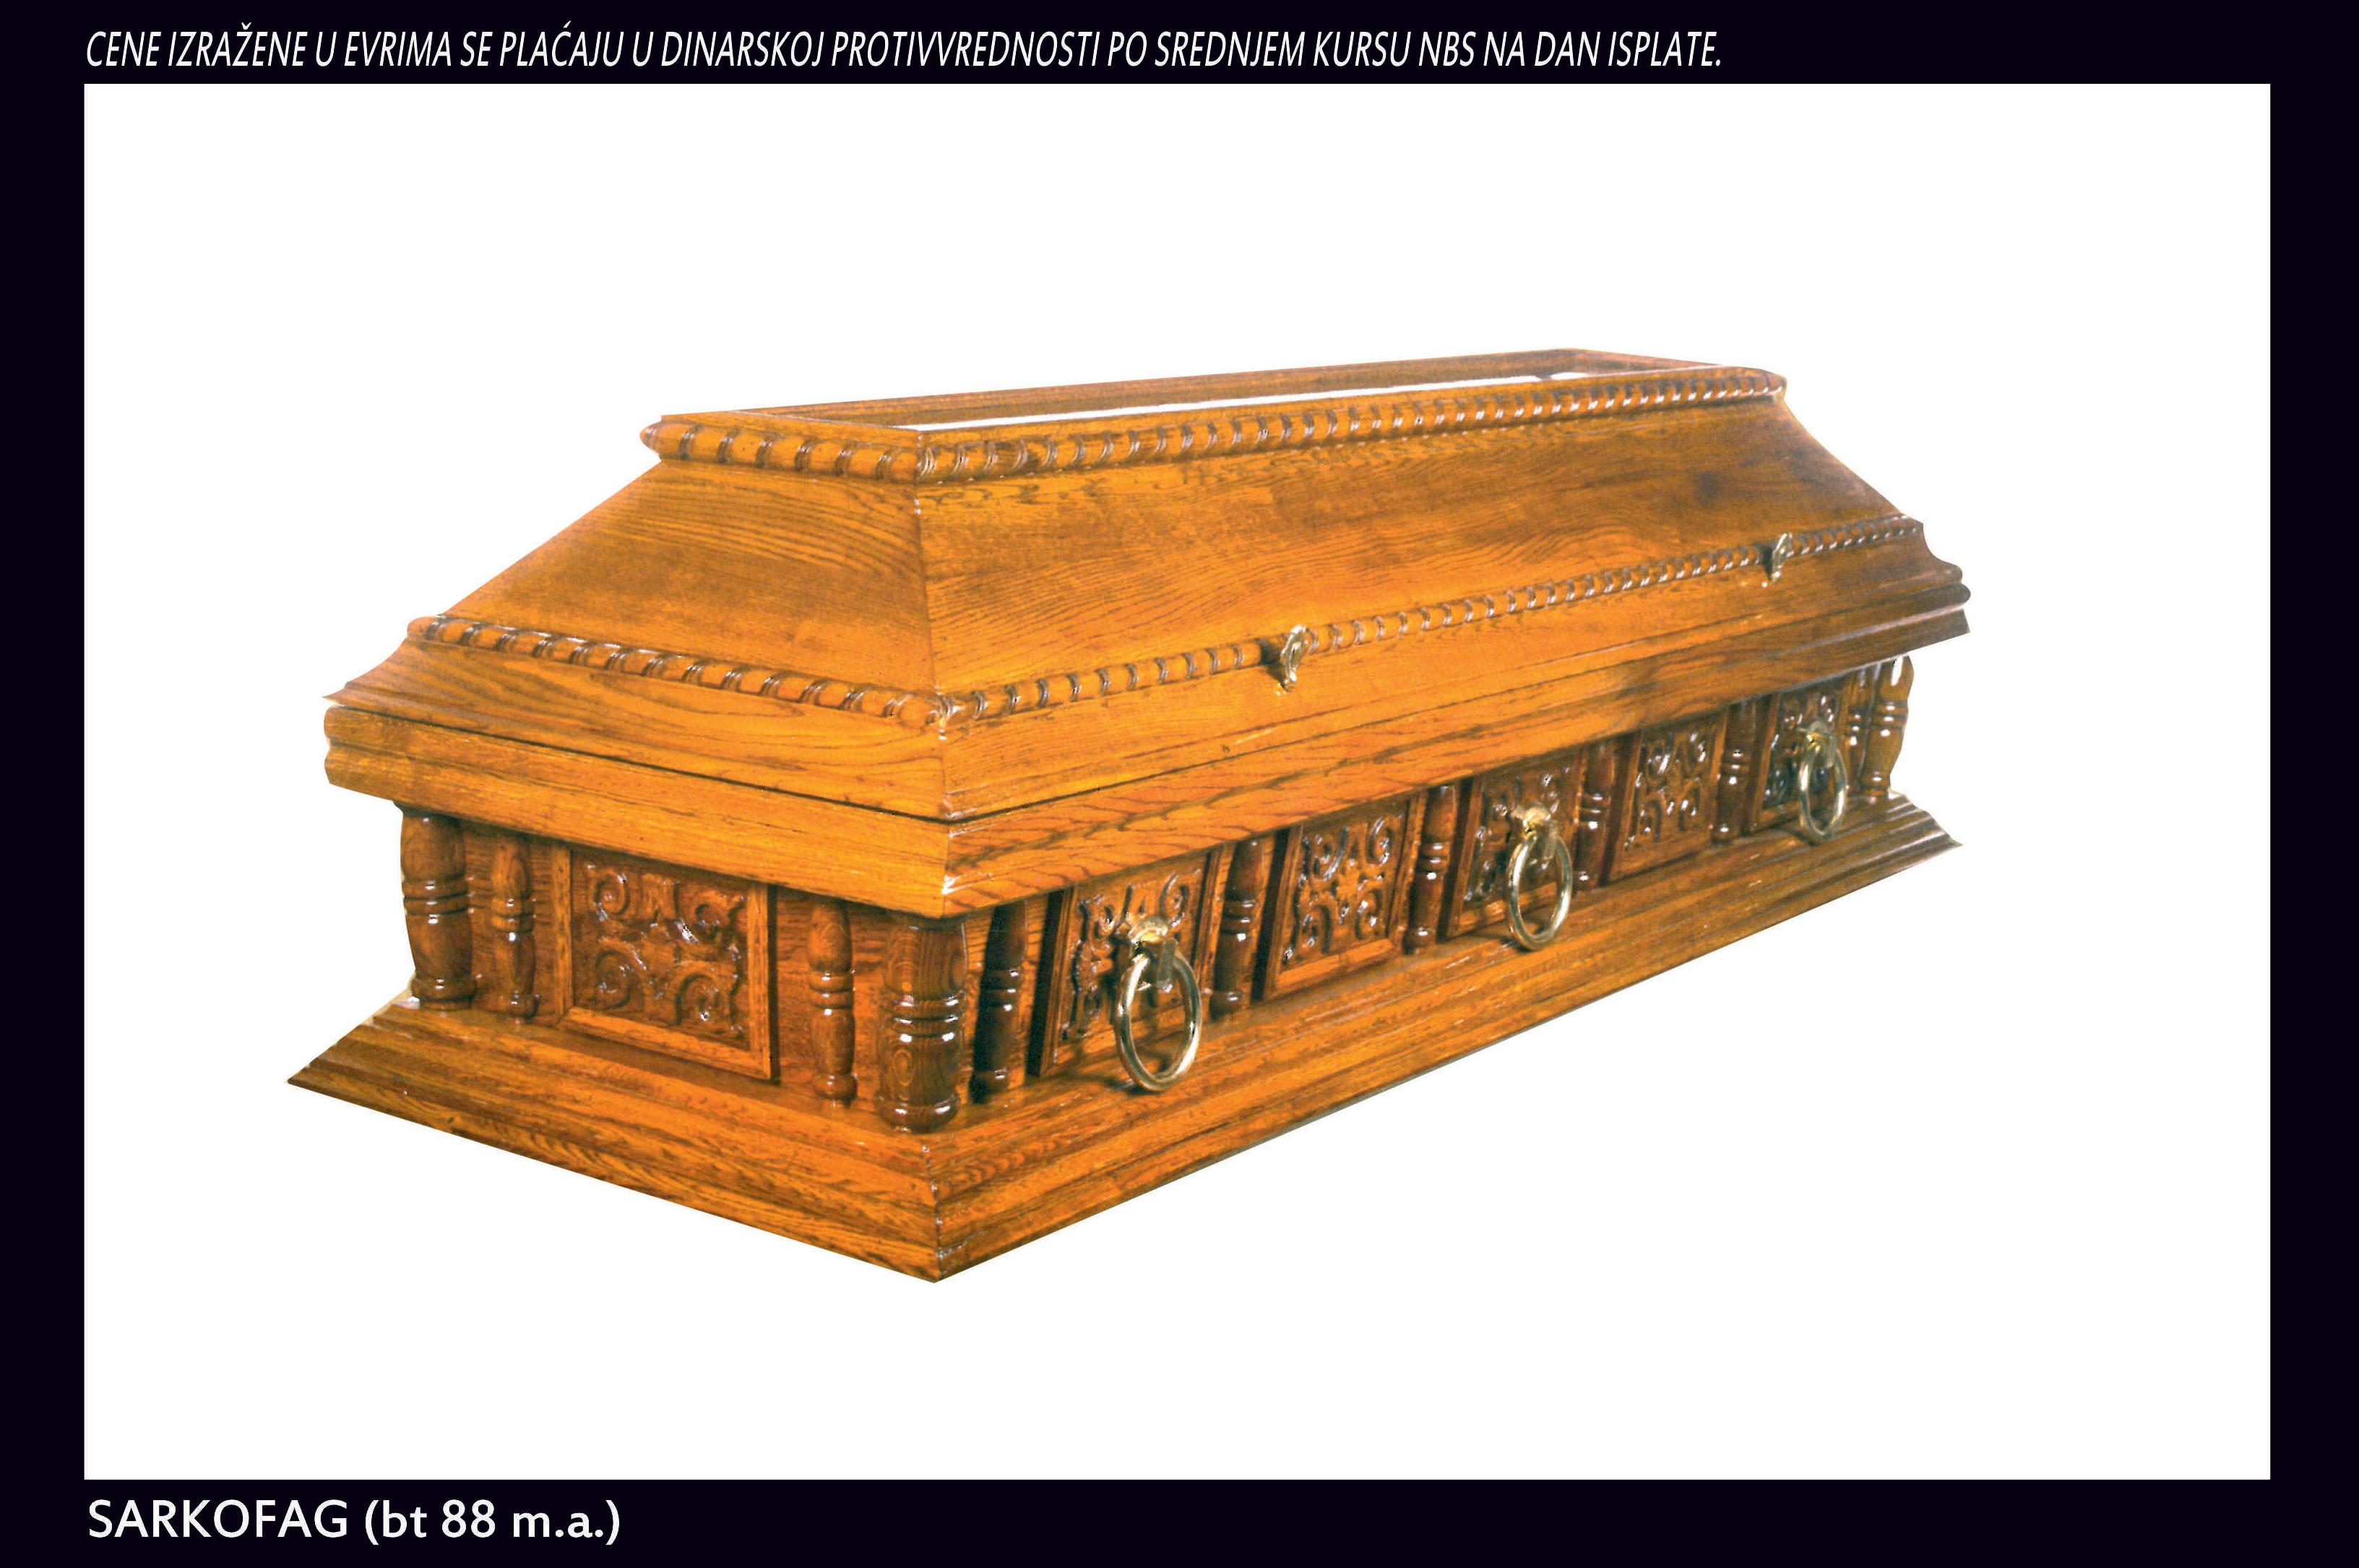 Sarkofag bt(88 m.a.)